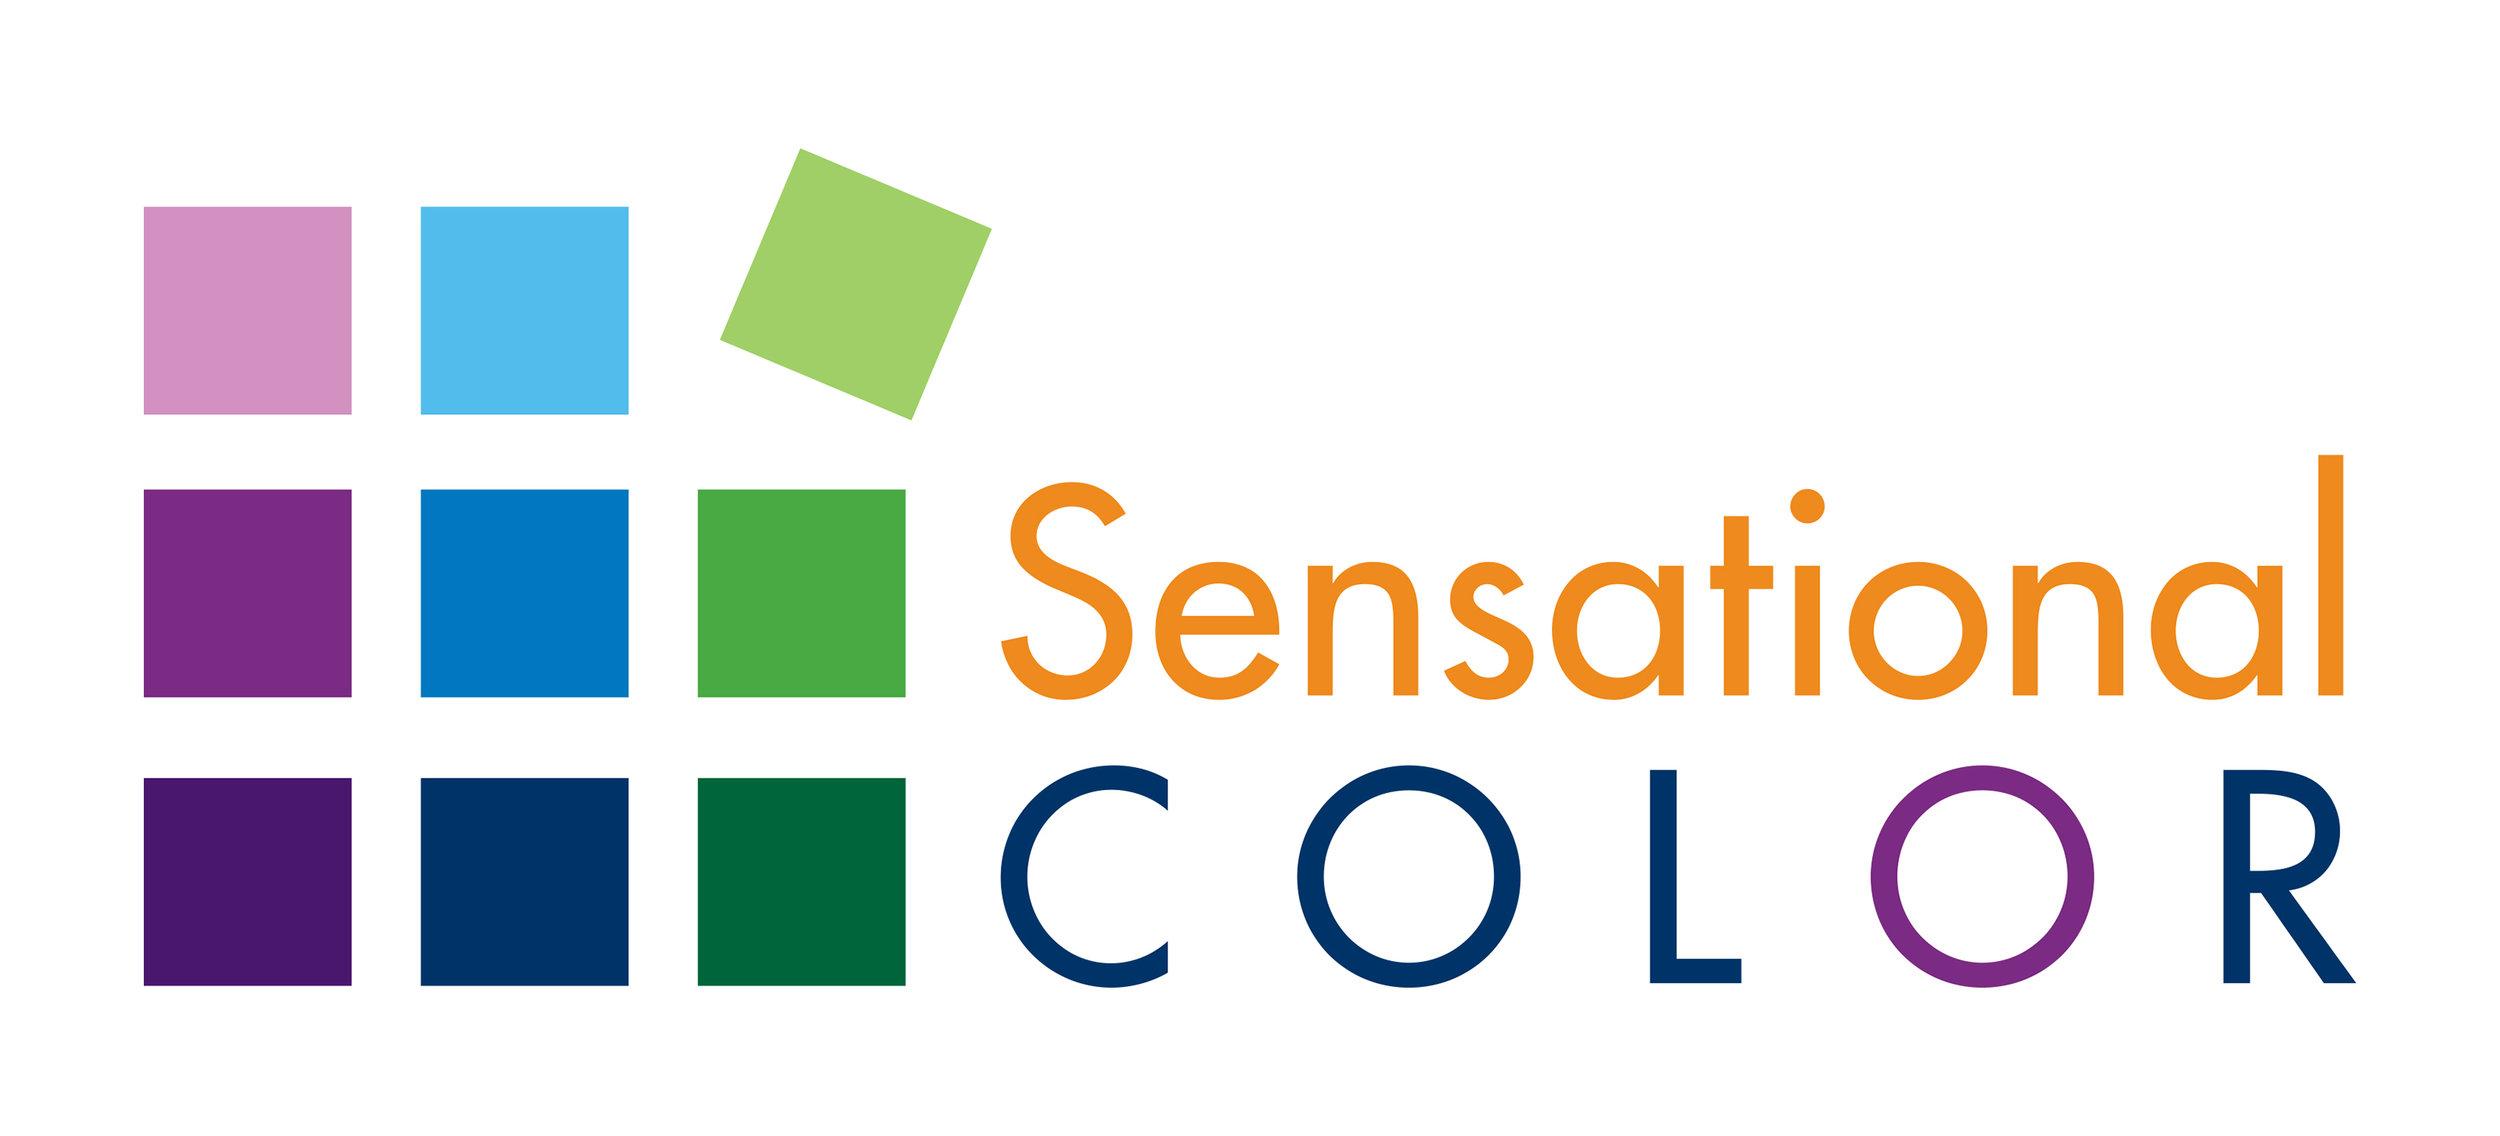 Sensational-Color-Logo-3300.jpg